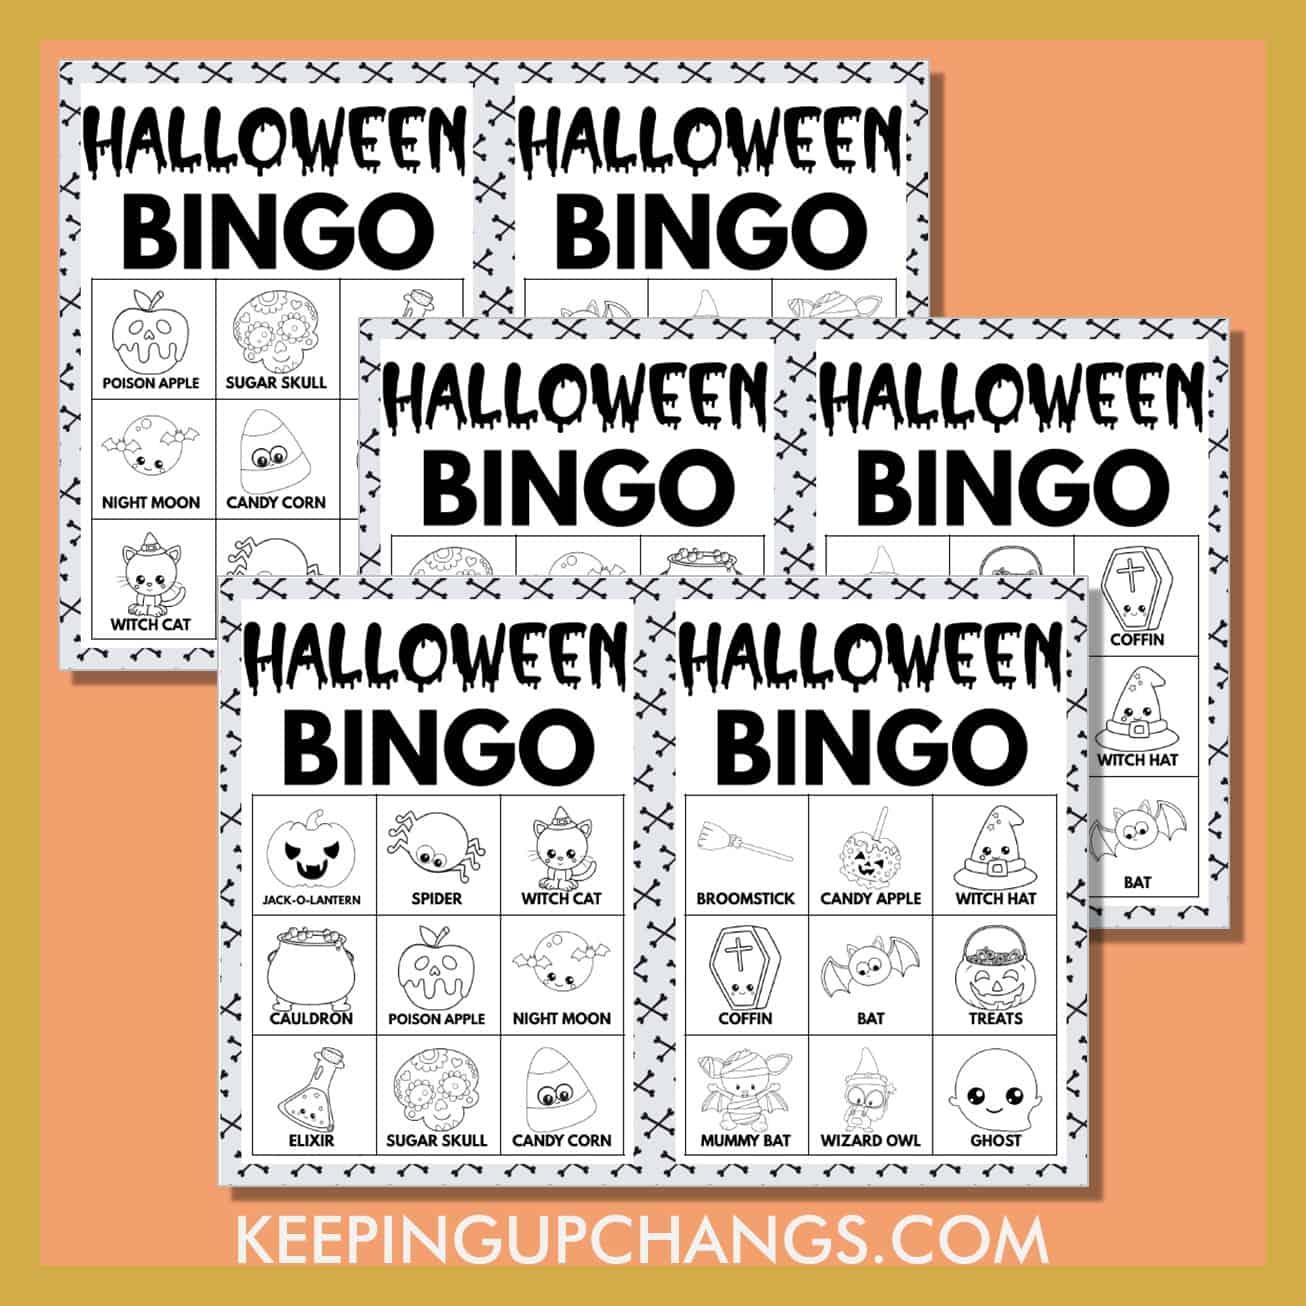 free fall halloween bingo 3x3 black white coloring game cards.